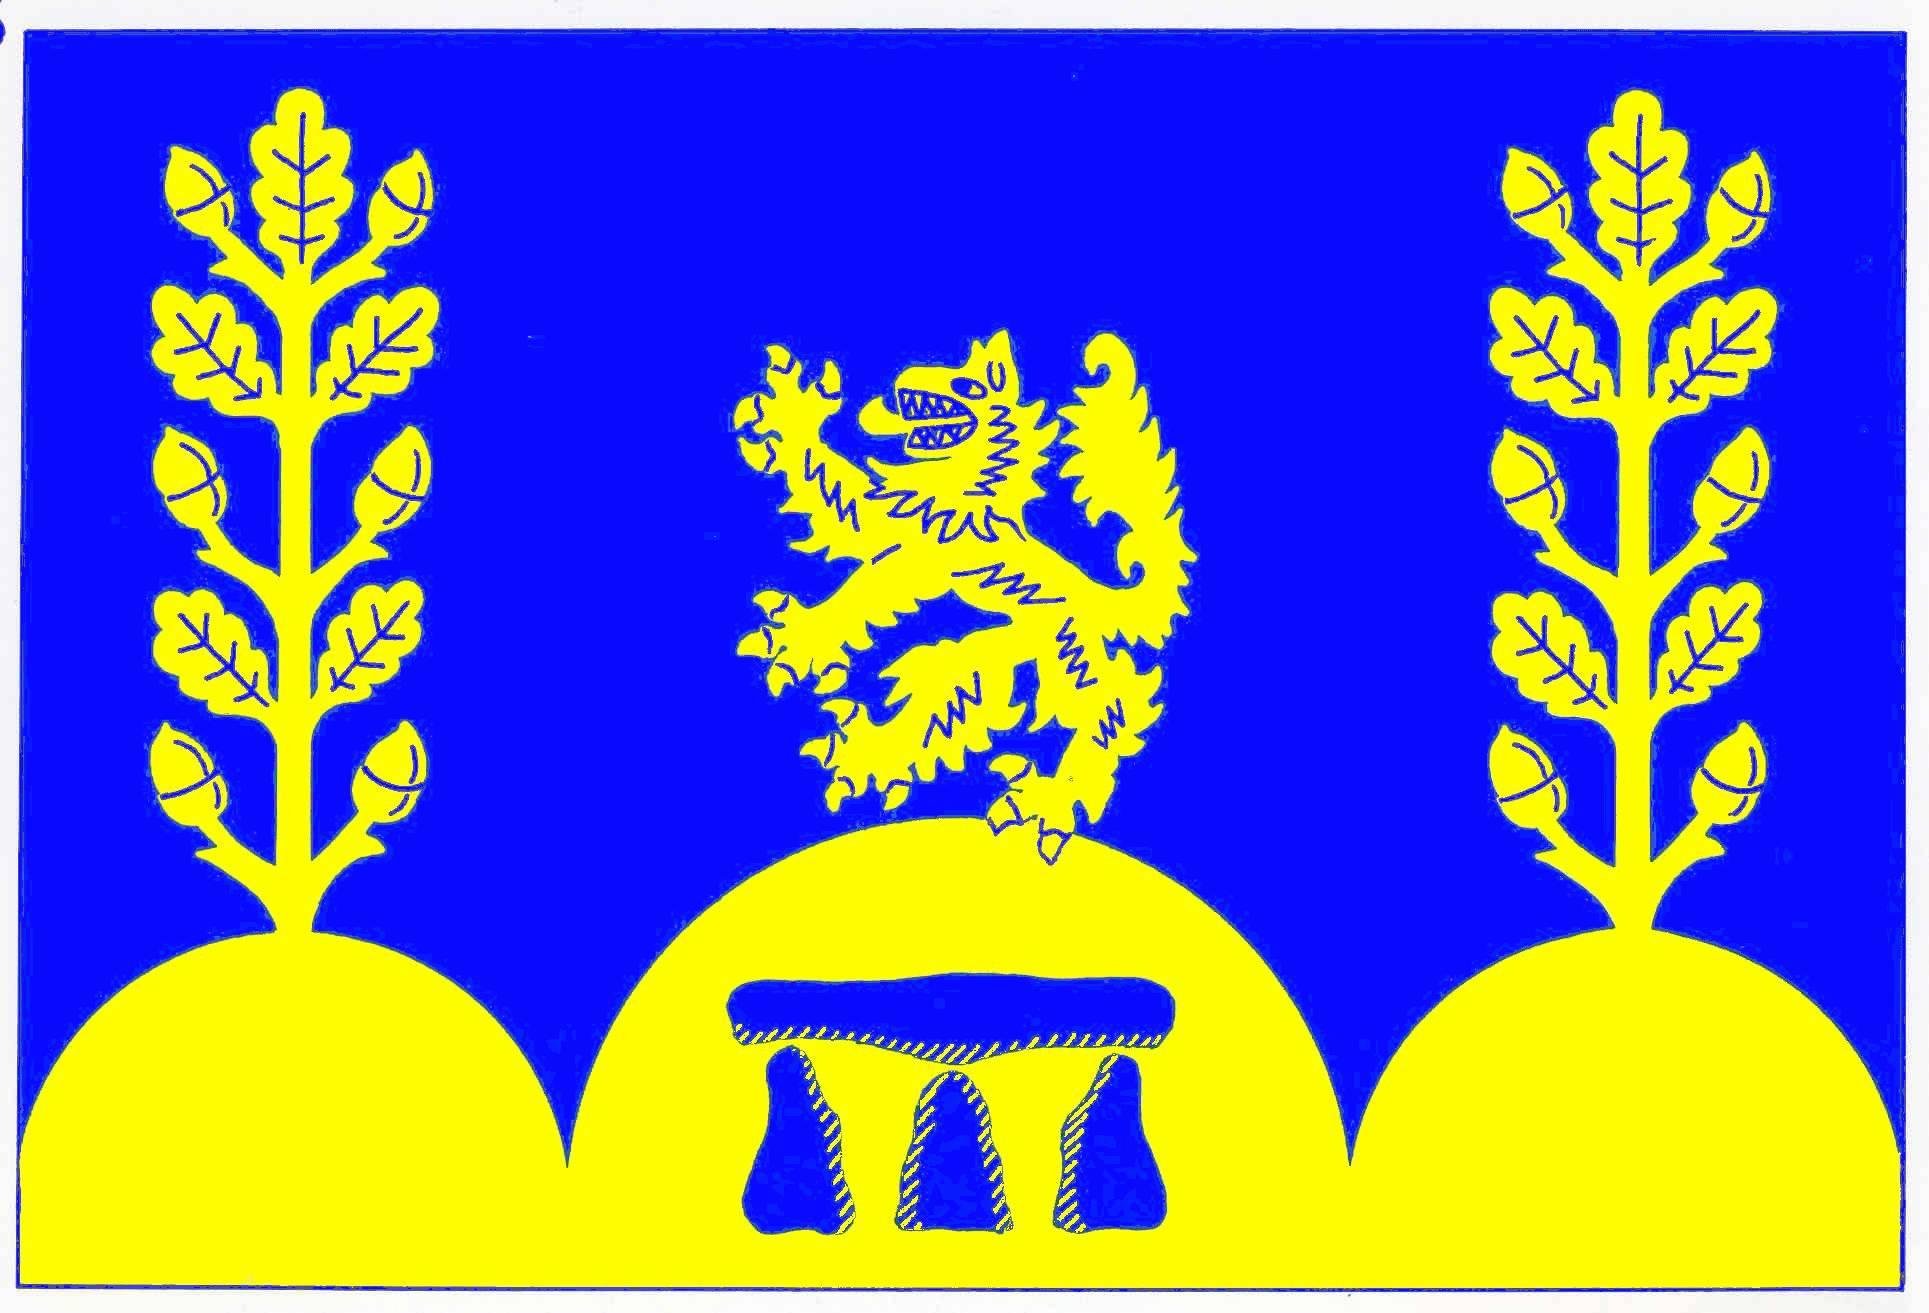 Flagge GemeindeDamendorf, Kreis Rendsburg-Eckernförde